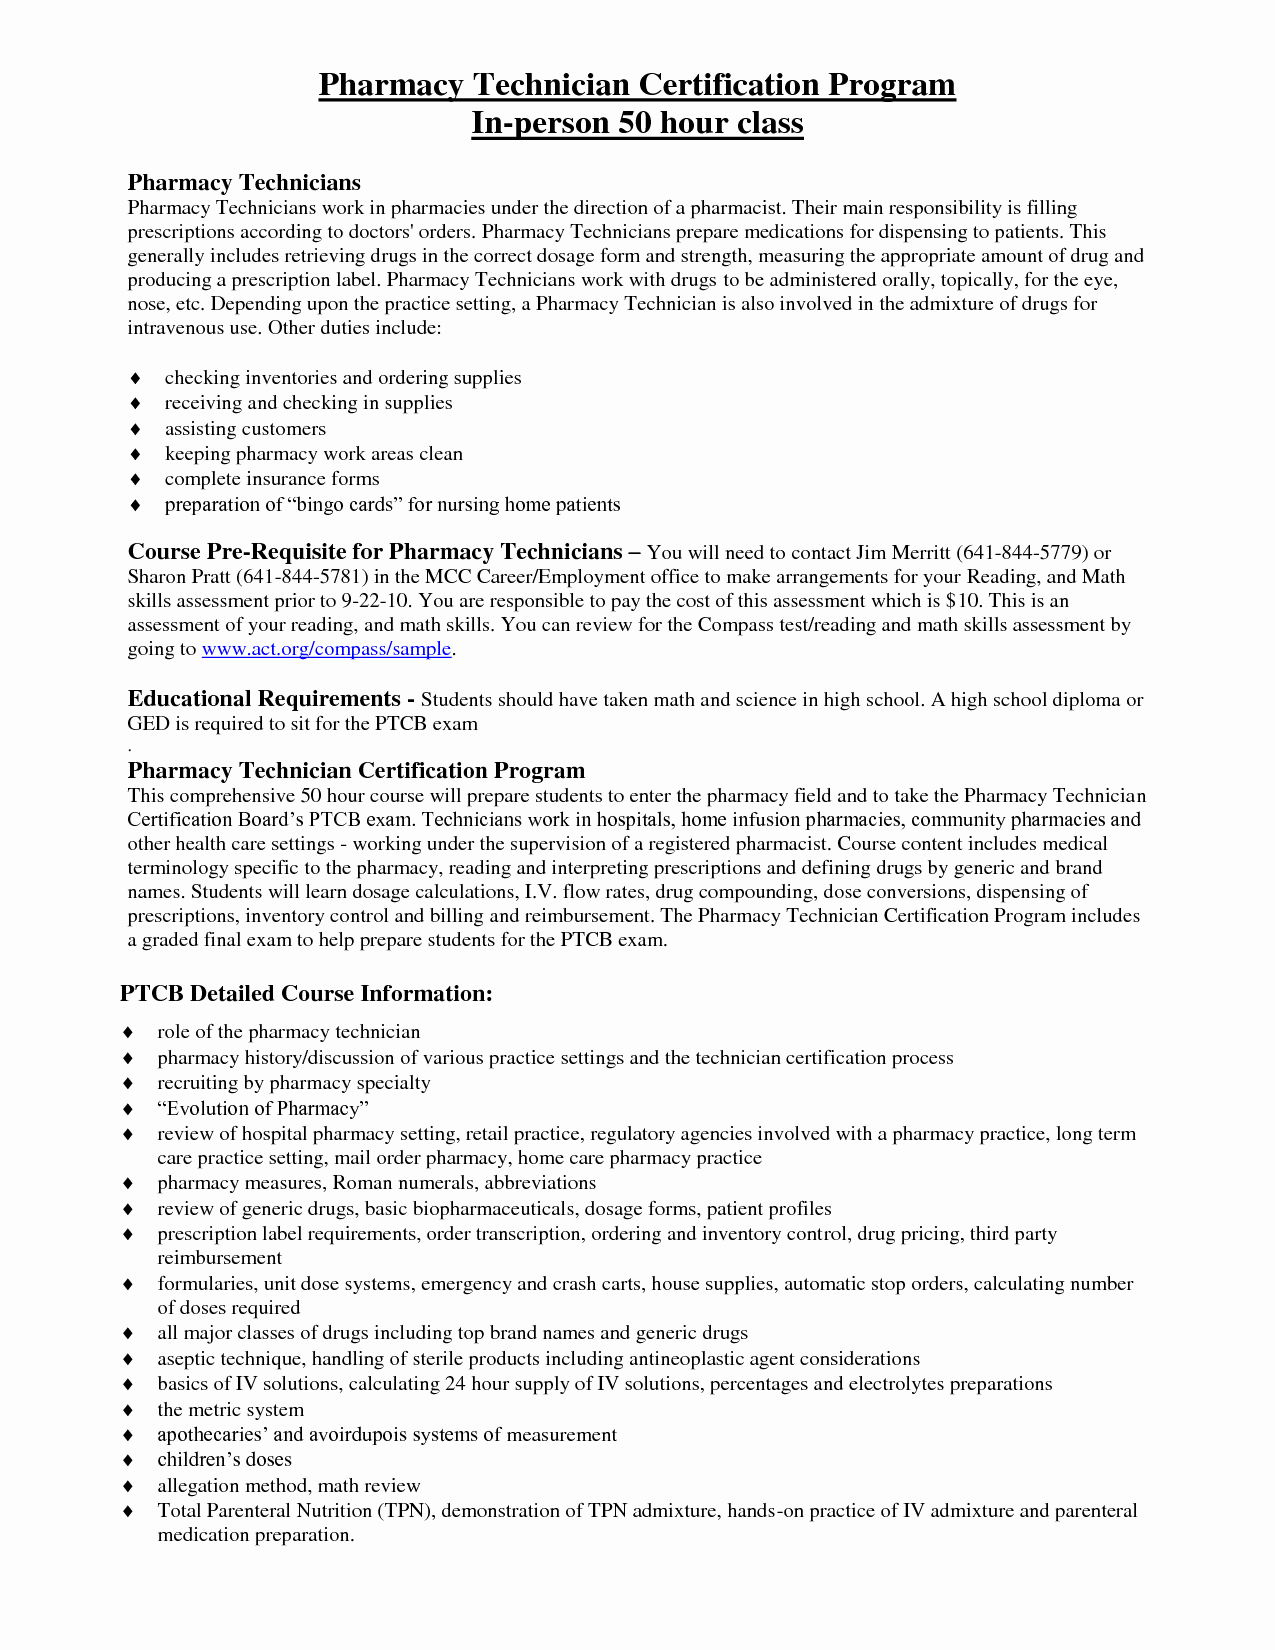 Certified Pharmacy Technician Resume Resume Ideas